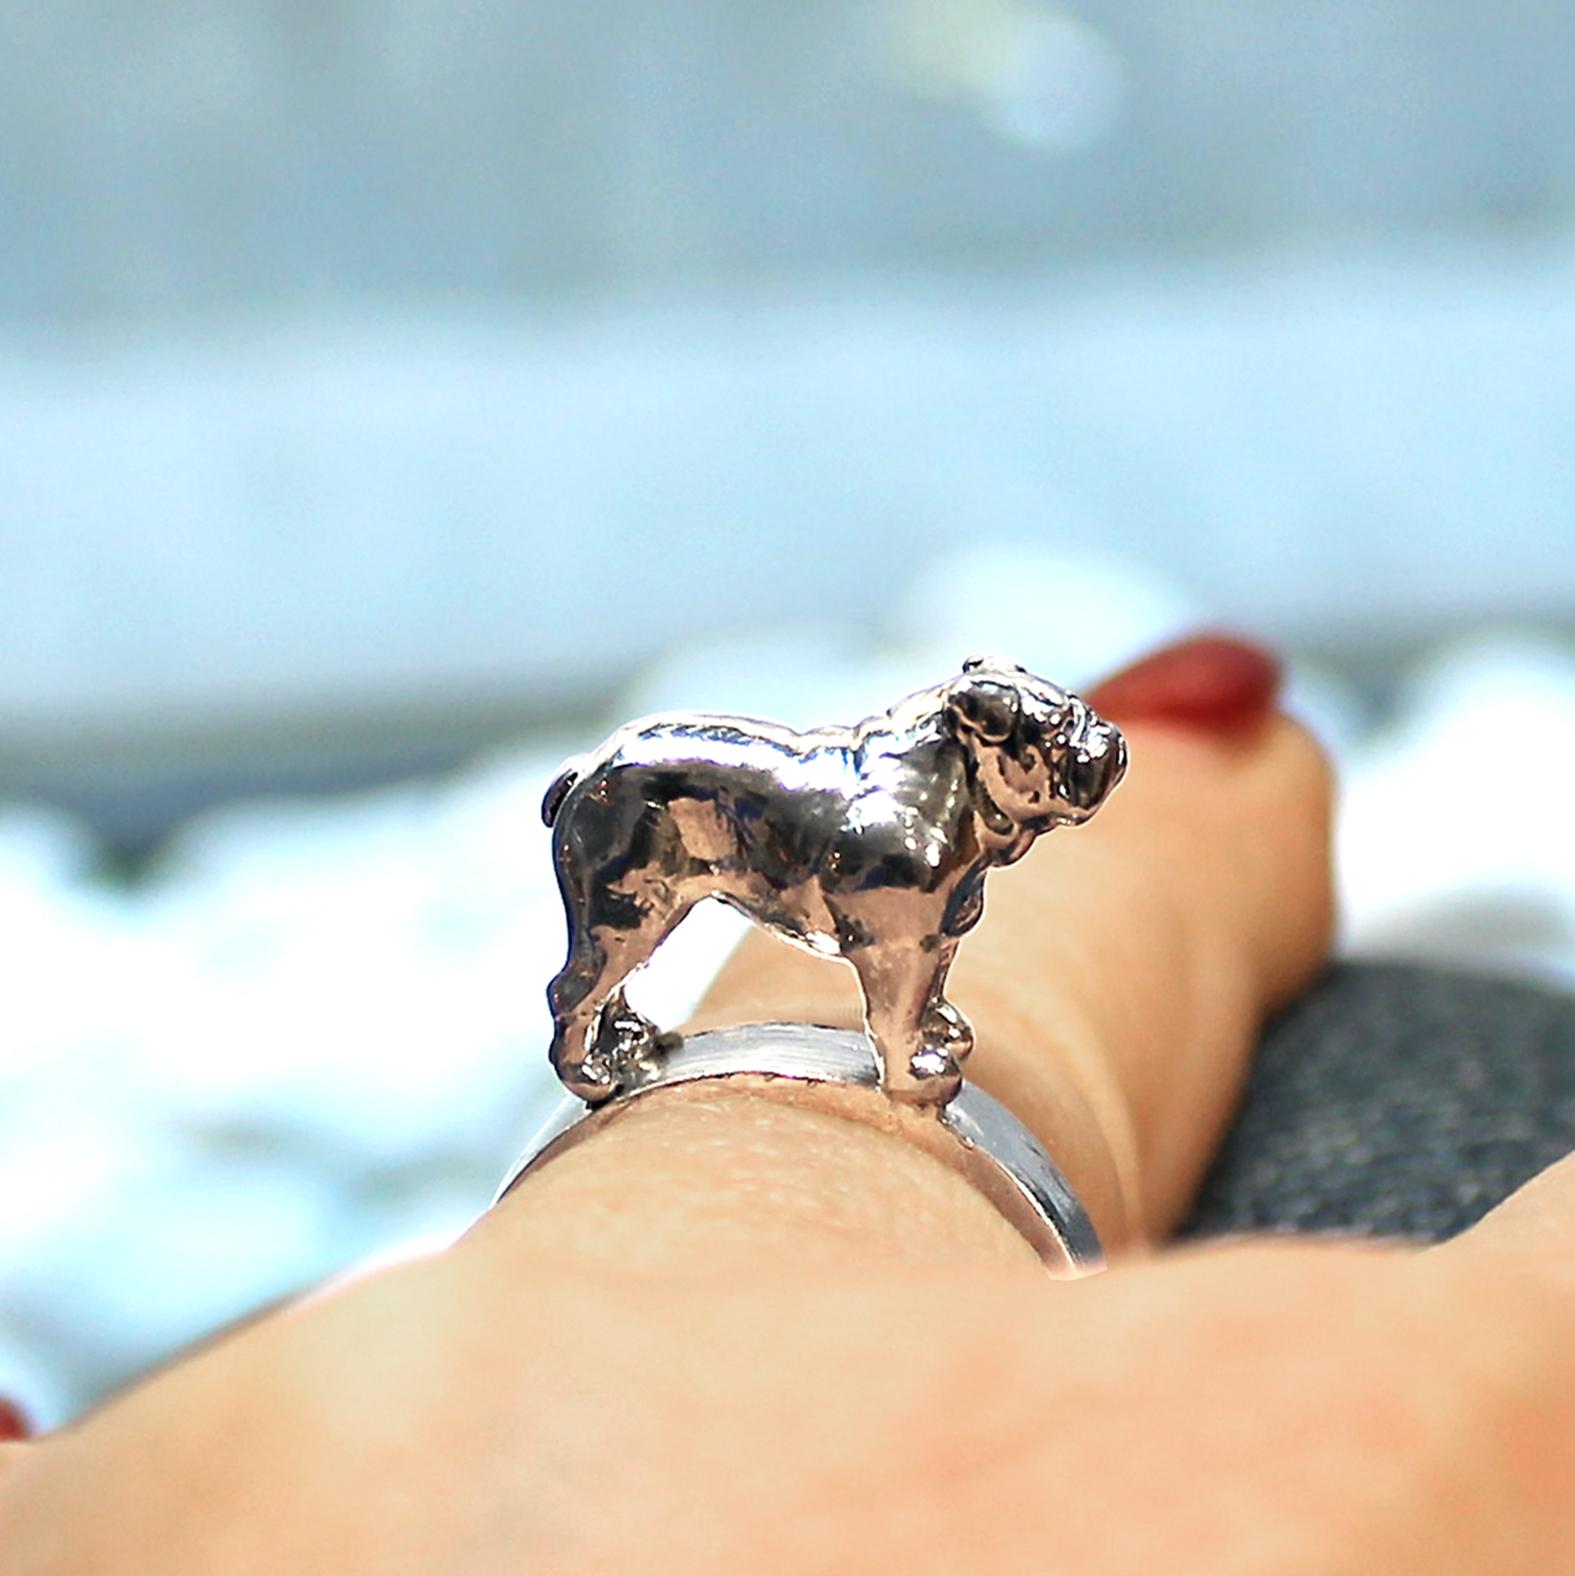 bulldog-inglese-anello